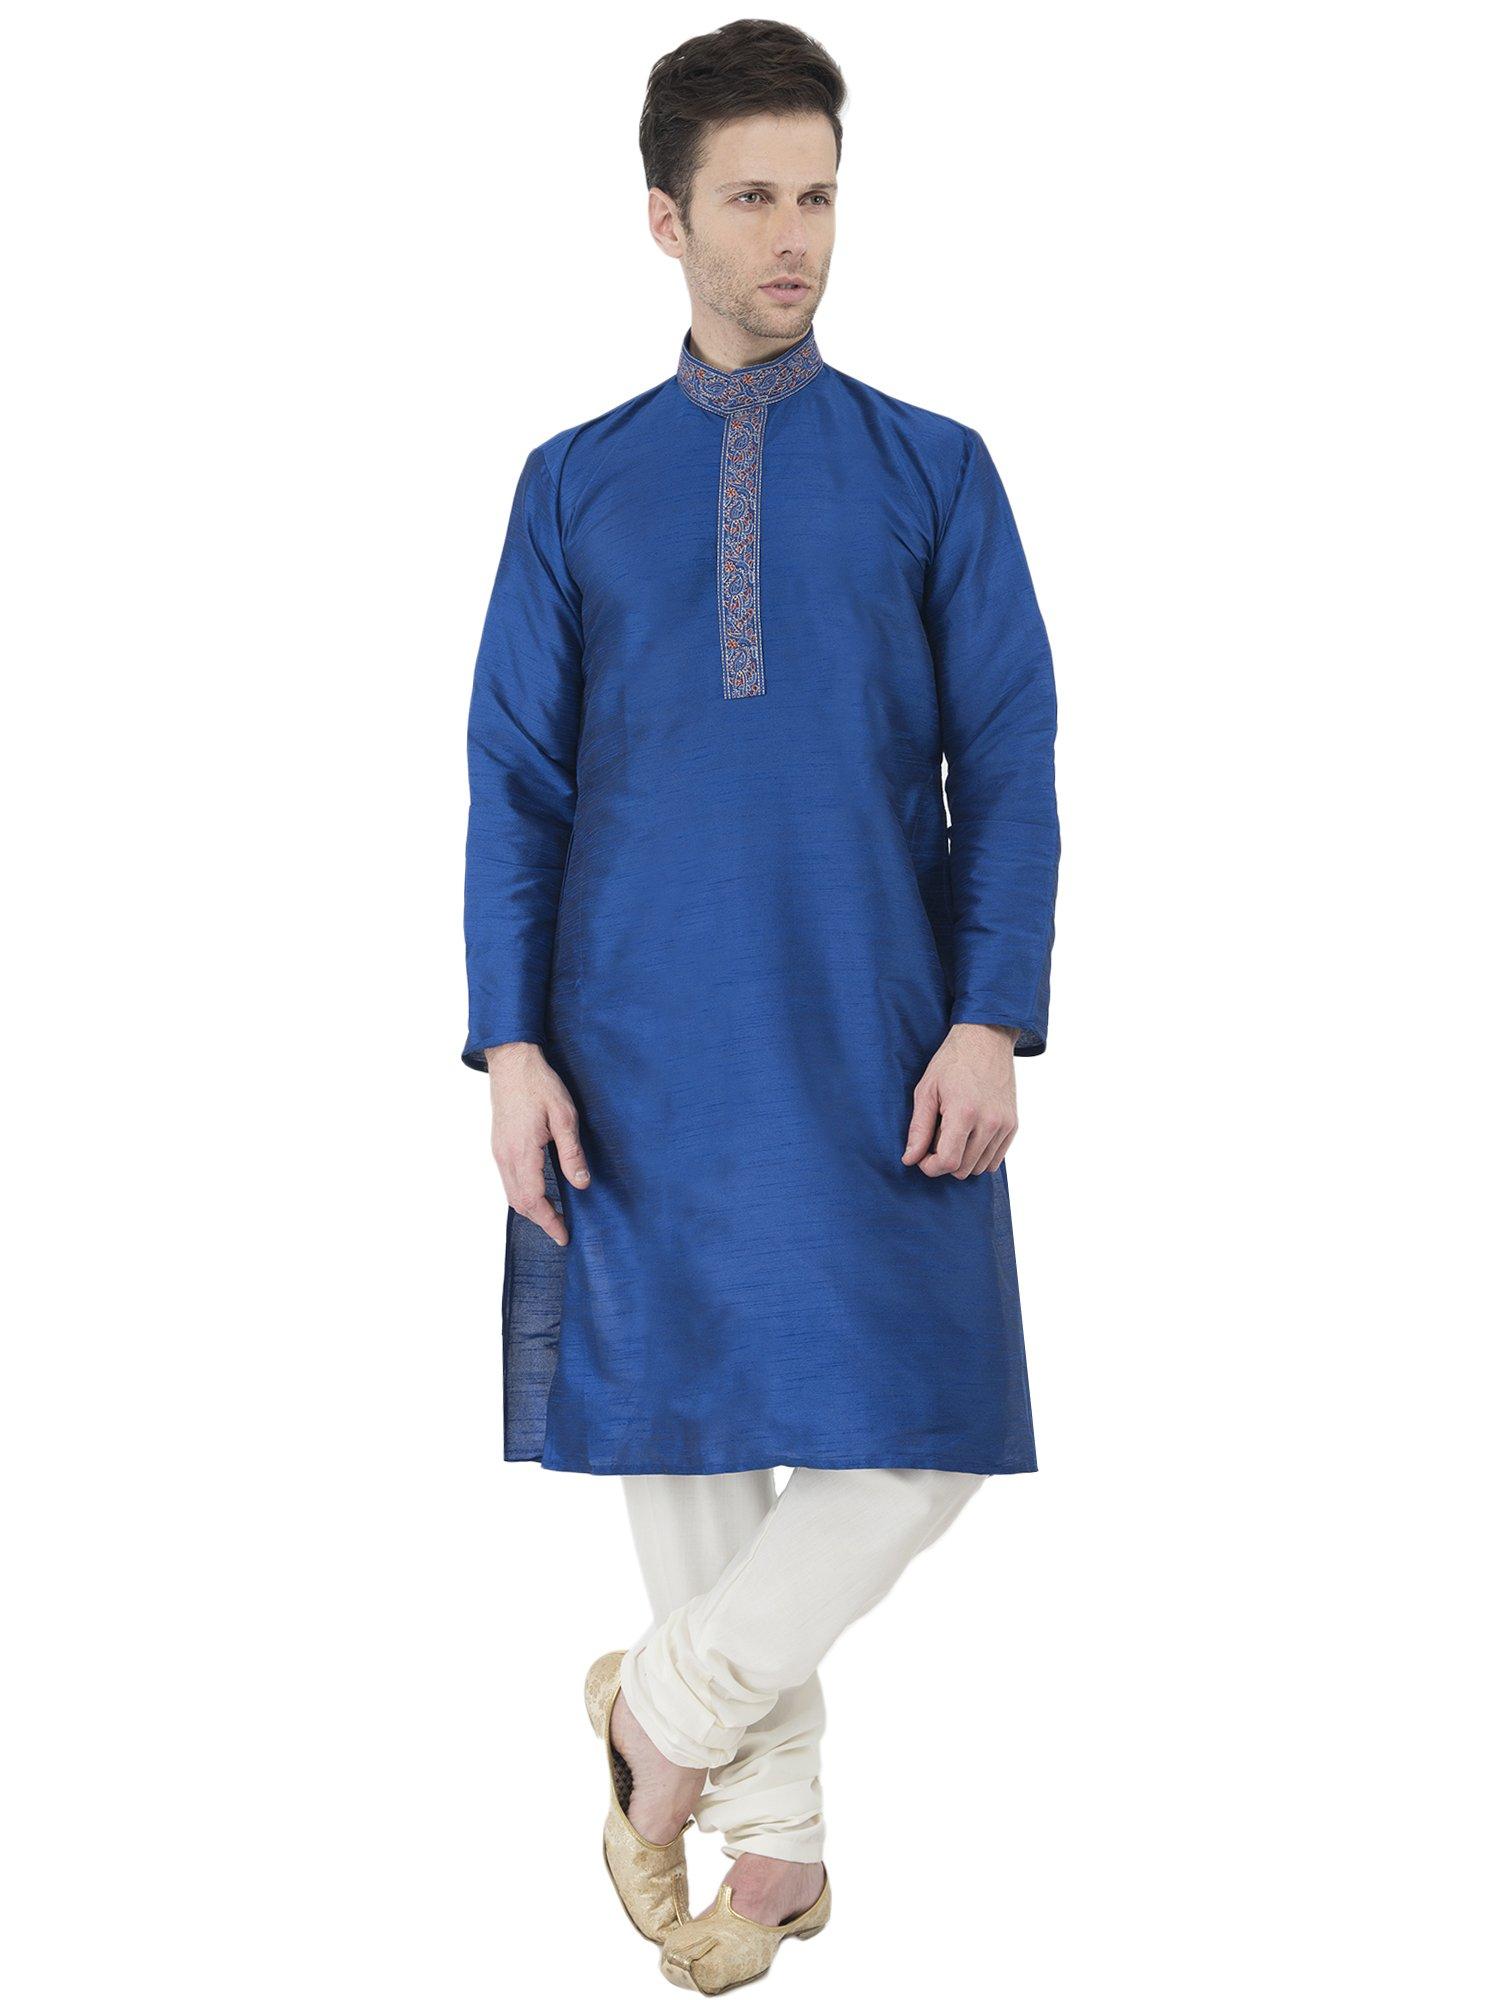 Indian Kurta Pajama Handmade Long Sleeve Button Down Shirt Traditional Blue Summer Dress -L